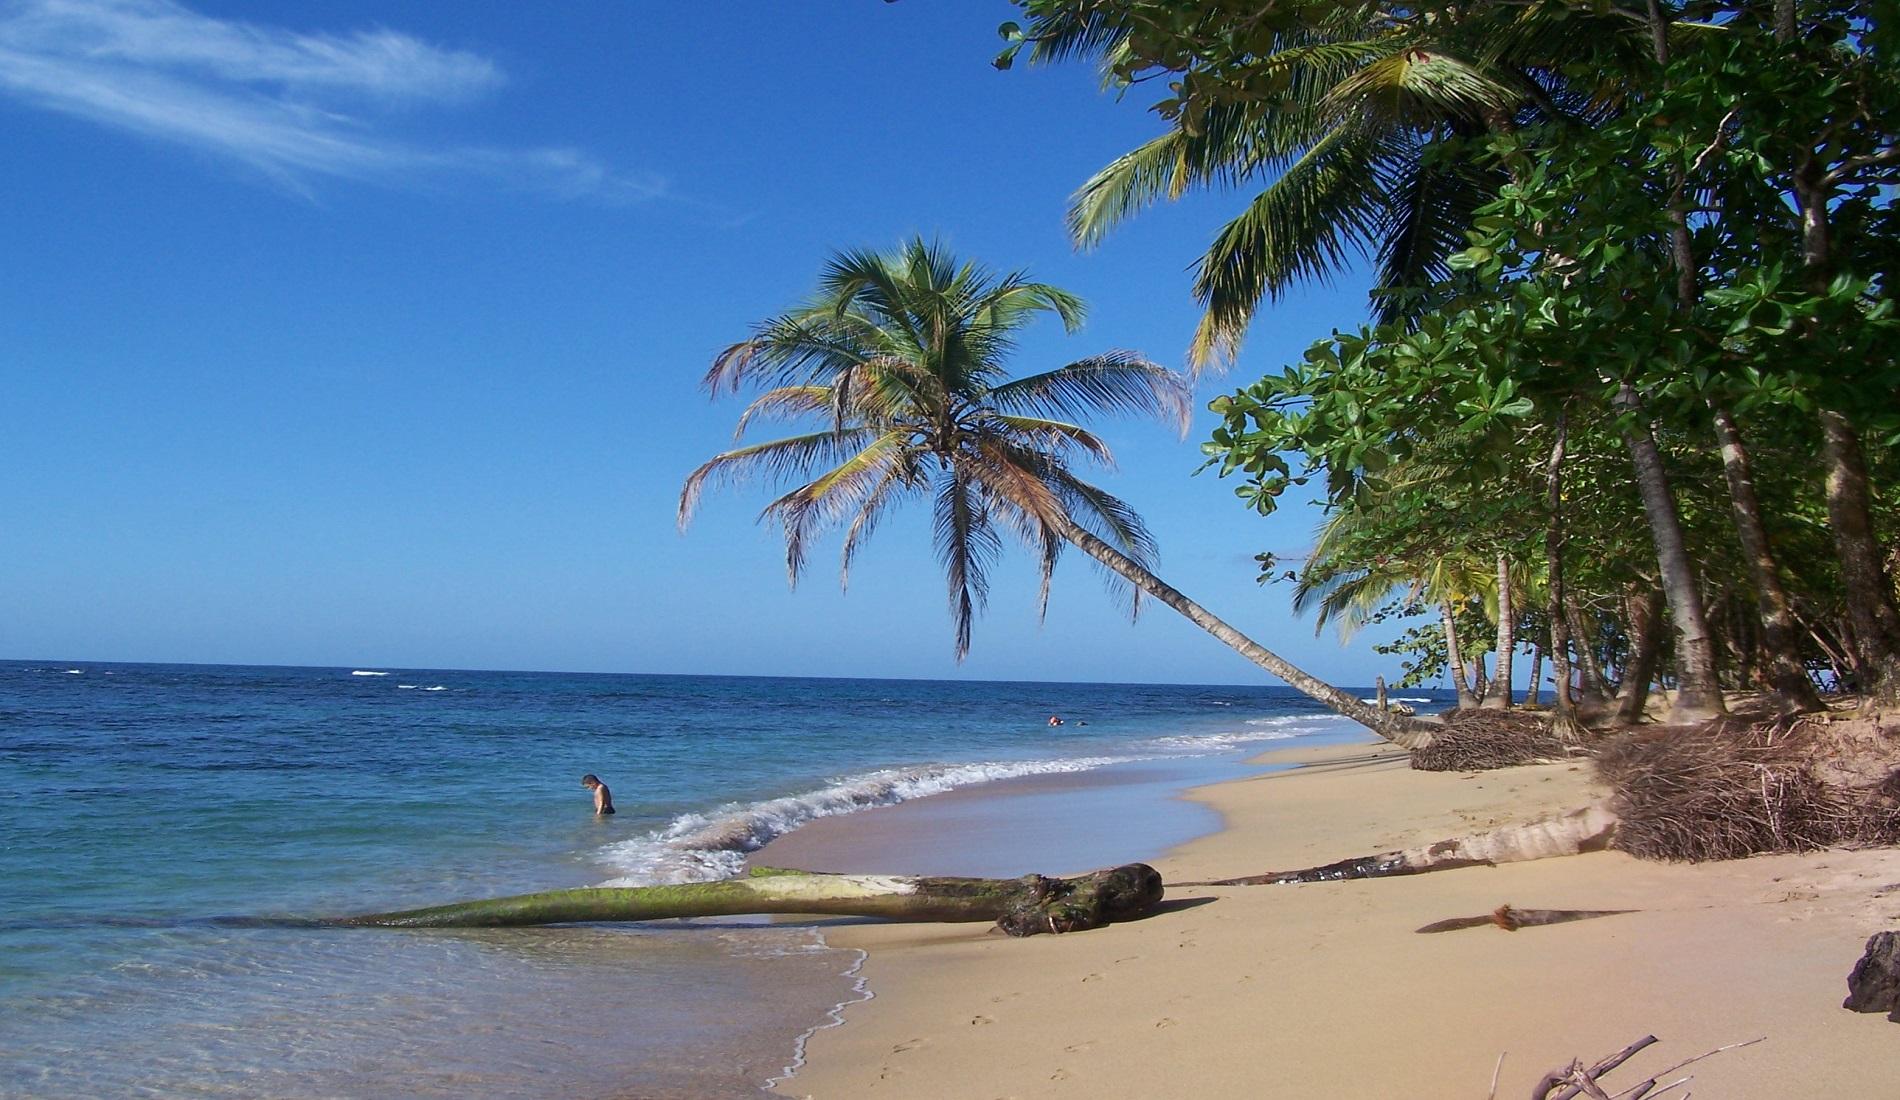 caribische kust strandvakantie costa rica